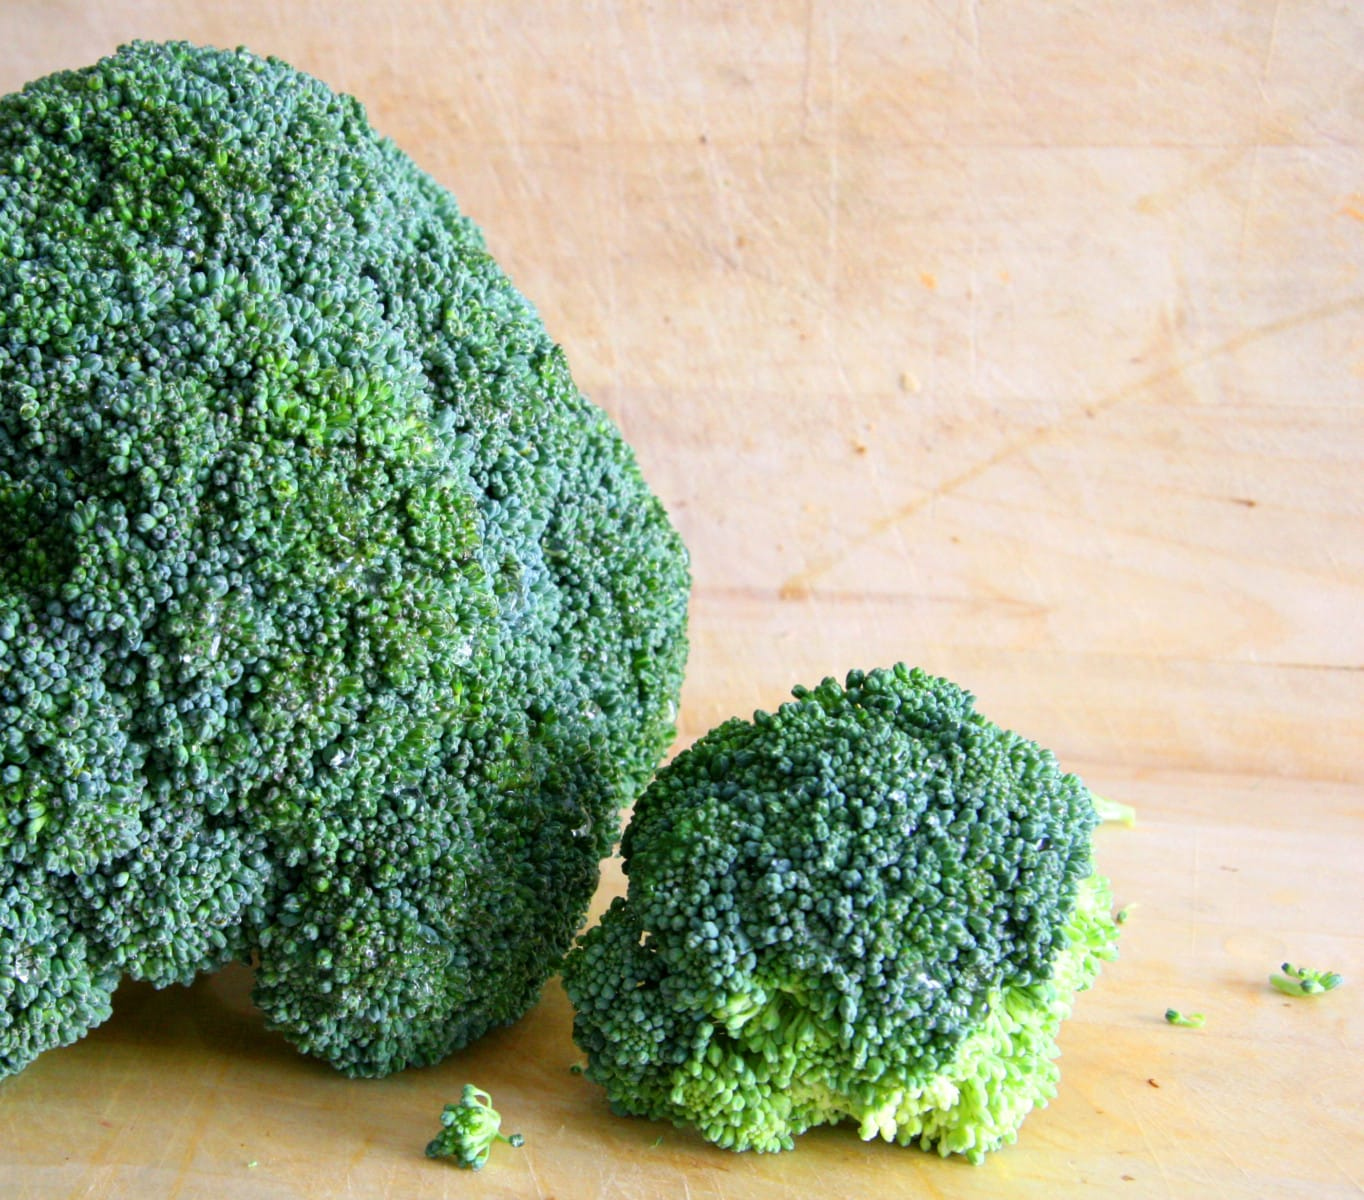 broccoli-1318644 (2)